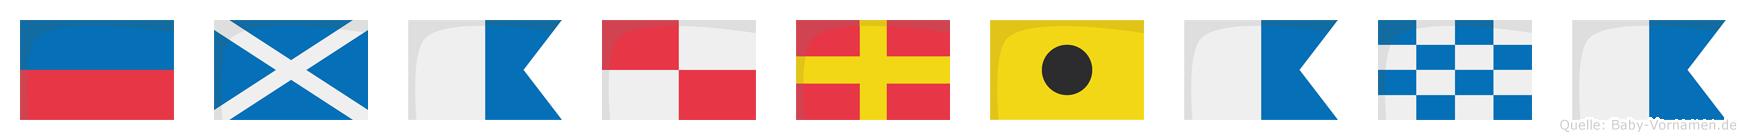 Emauriana im Flaggenalphabet